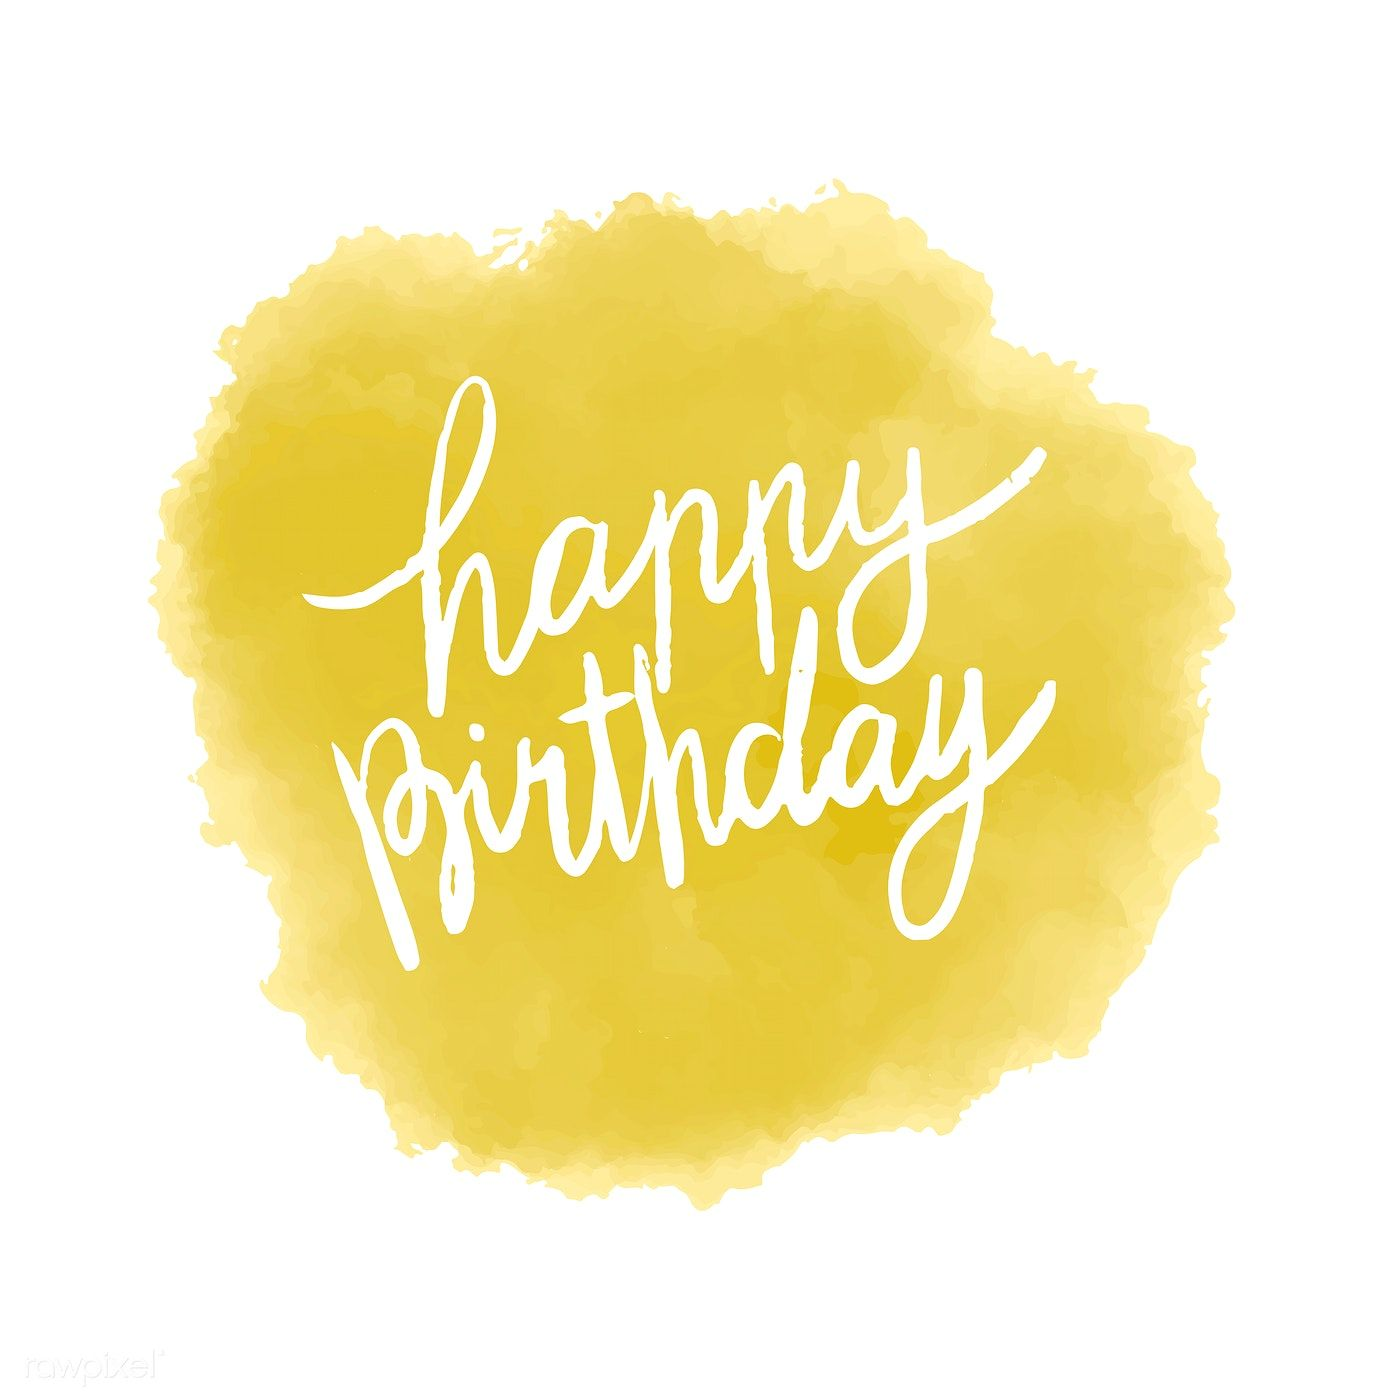 Happy Birthday Typography Vector In Yellow Free Image By Rawpixel Com Birthday Typography Happy Birthday Typography Happy Birthday Font